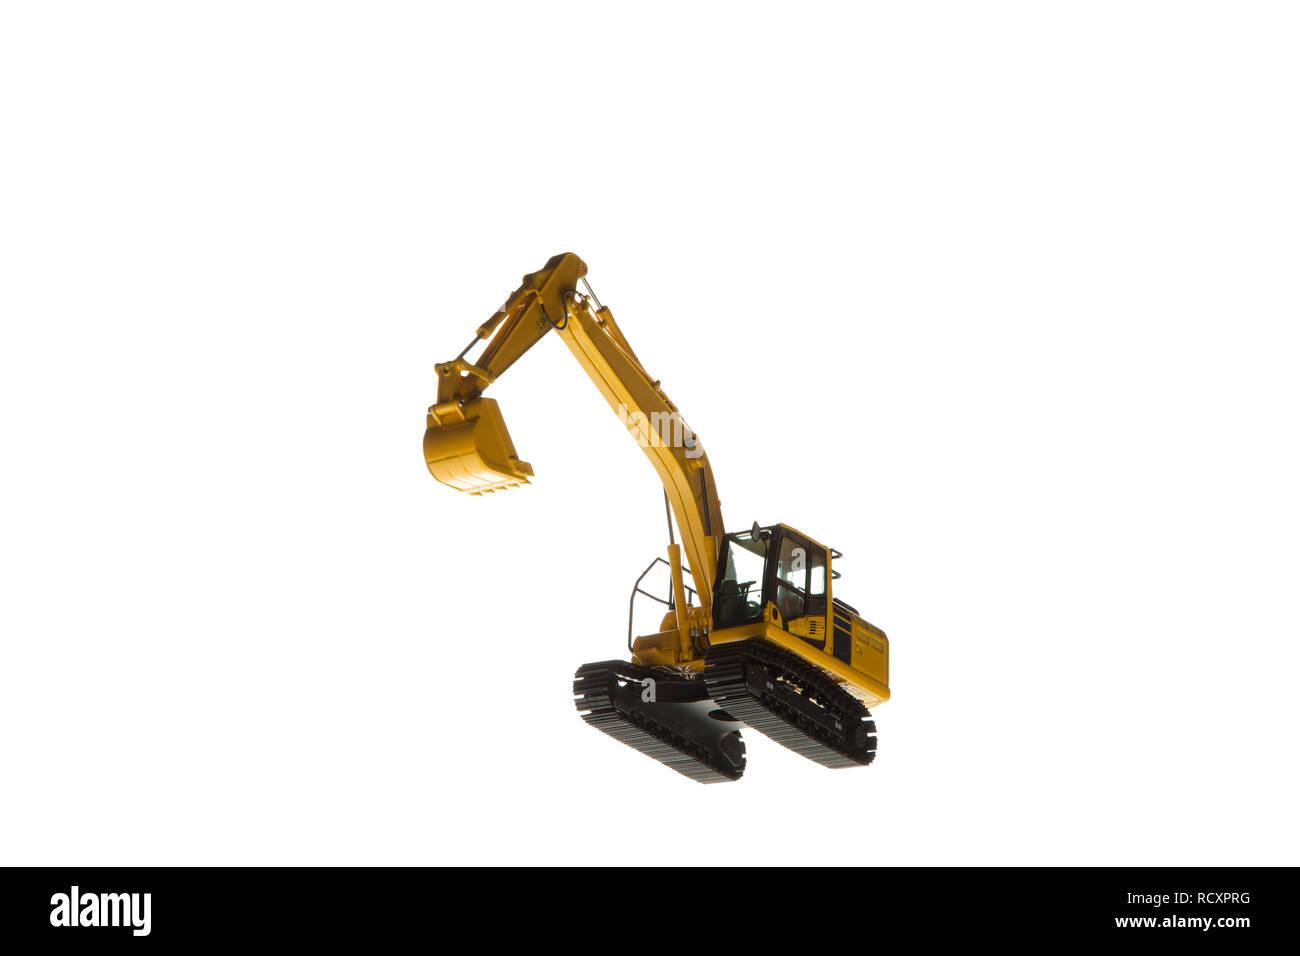 Excavator construction machinery isolated on white background - Stock Image